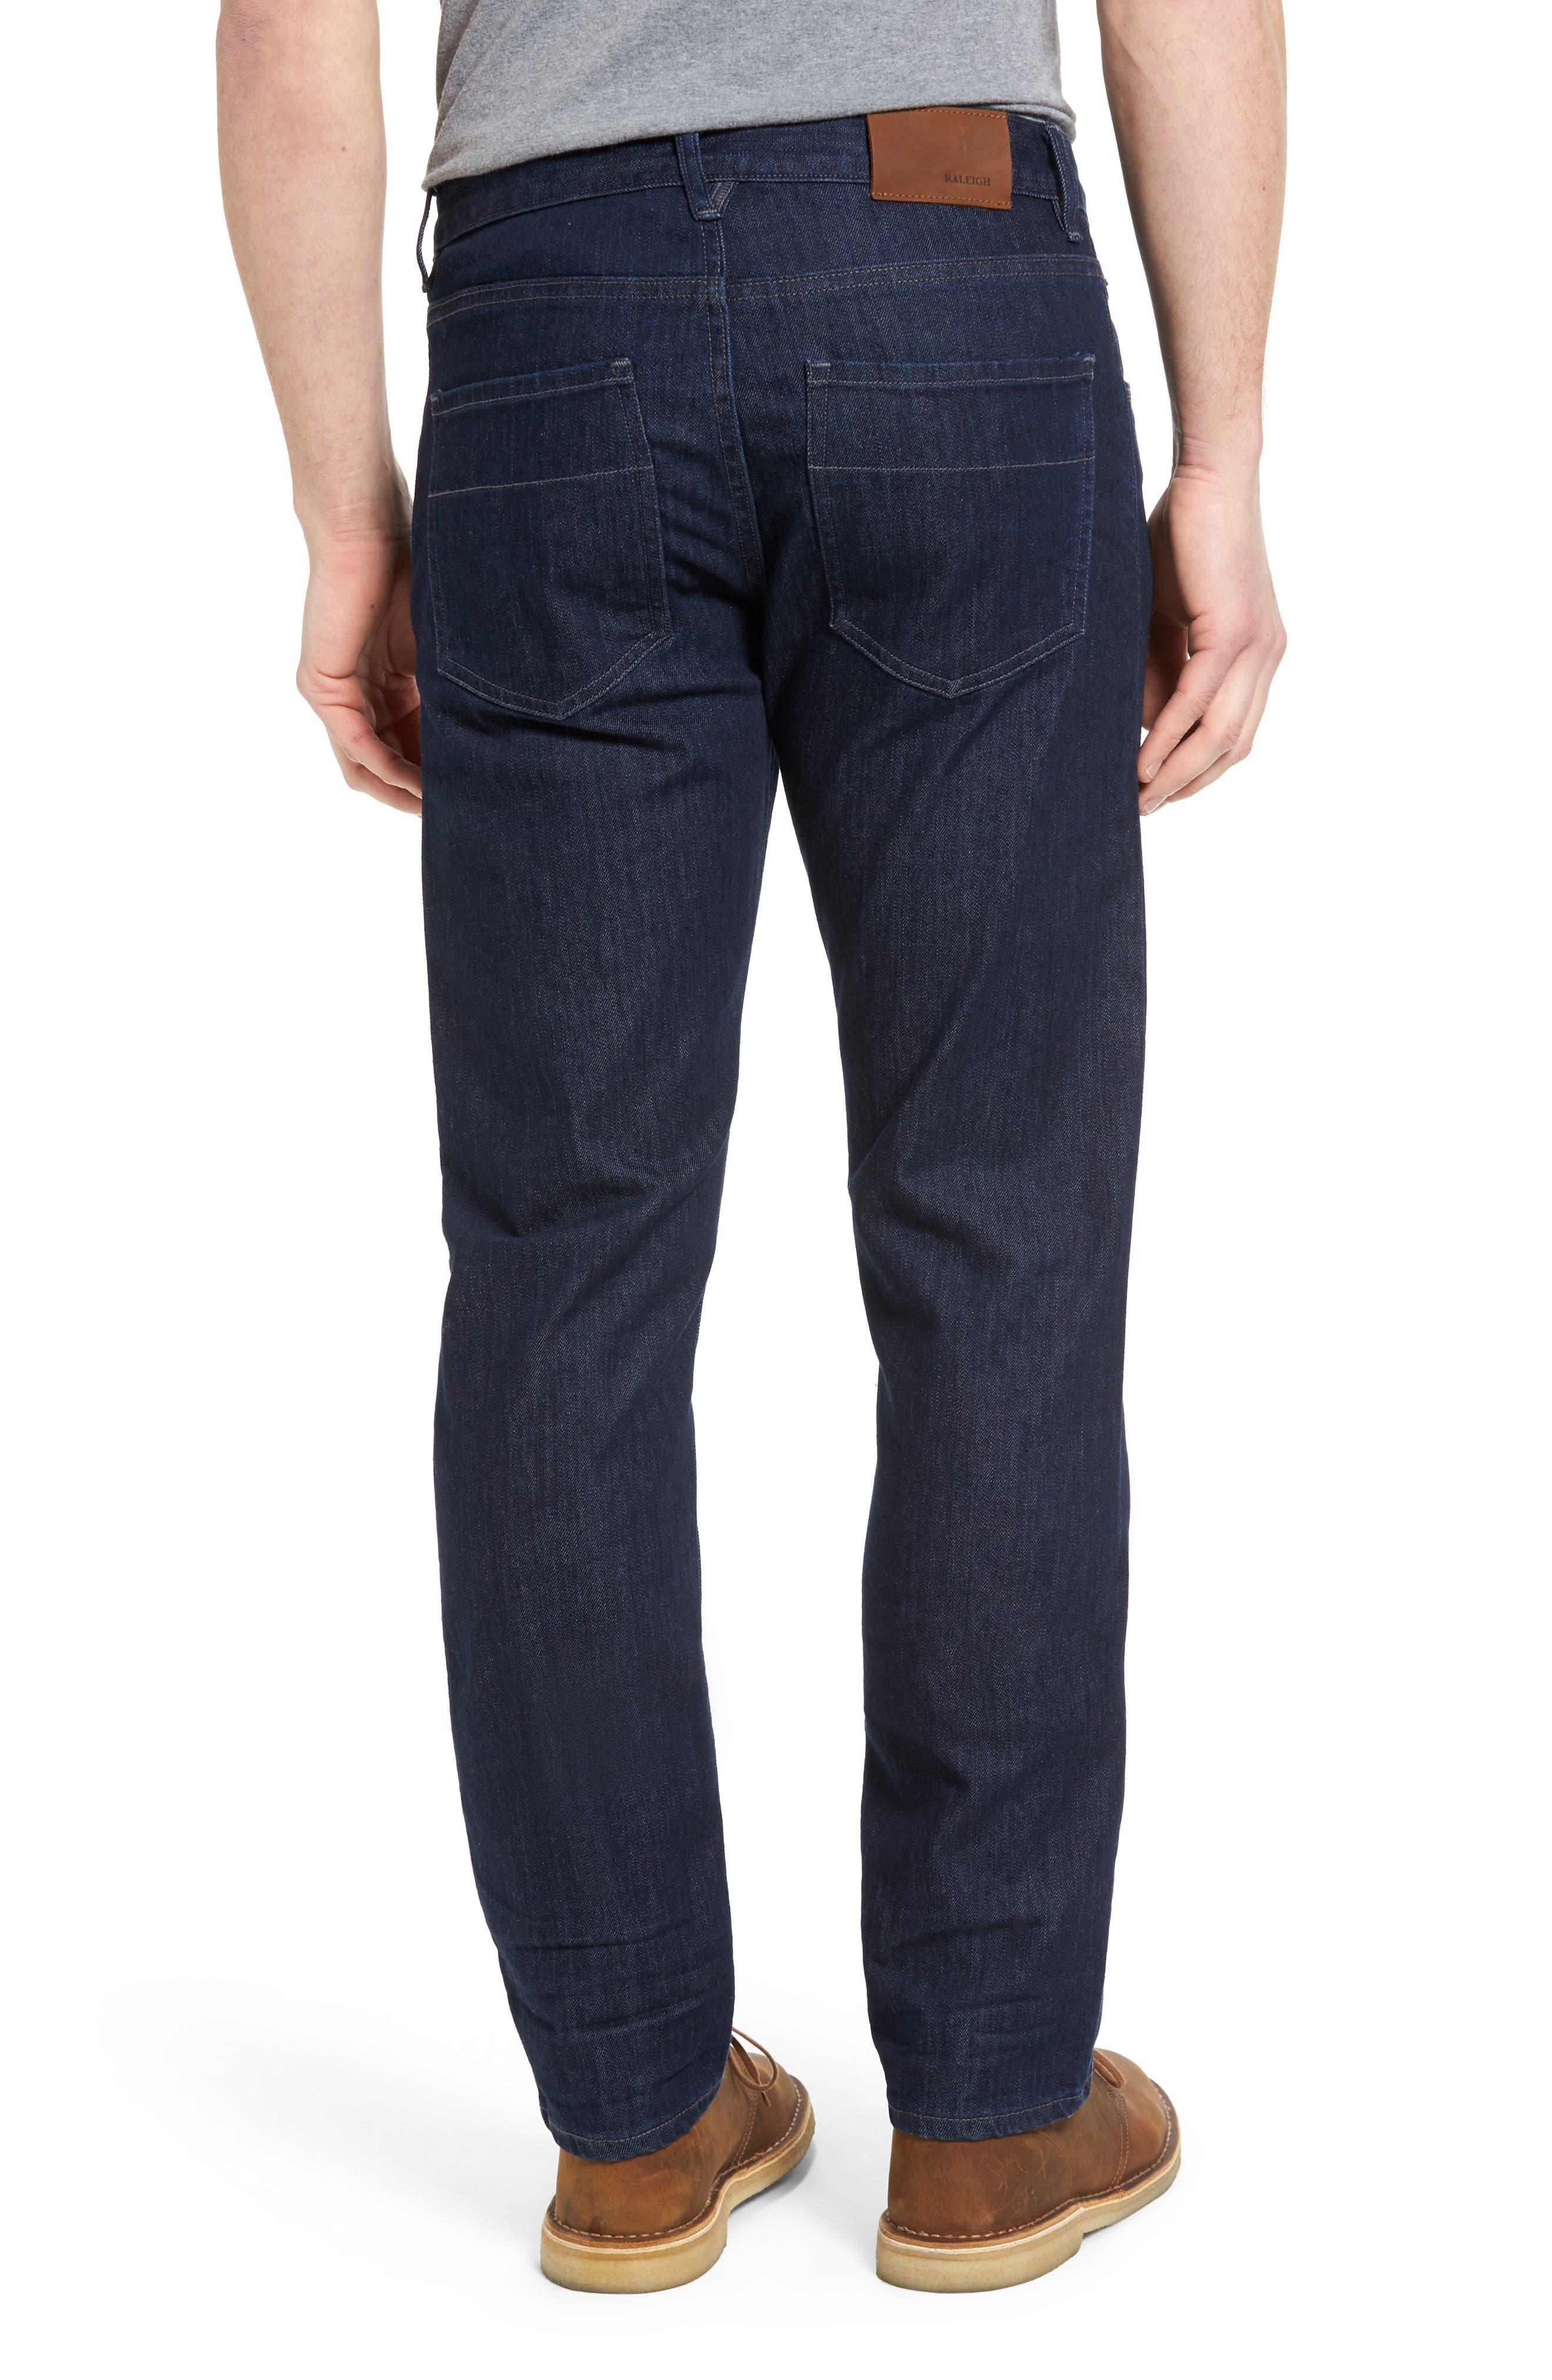 Jones Slim Fit Jeans,                             Alternate thumbnail 2, color,                             418